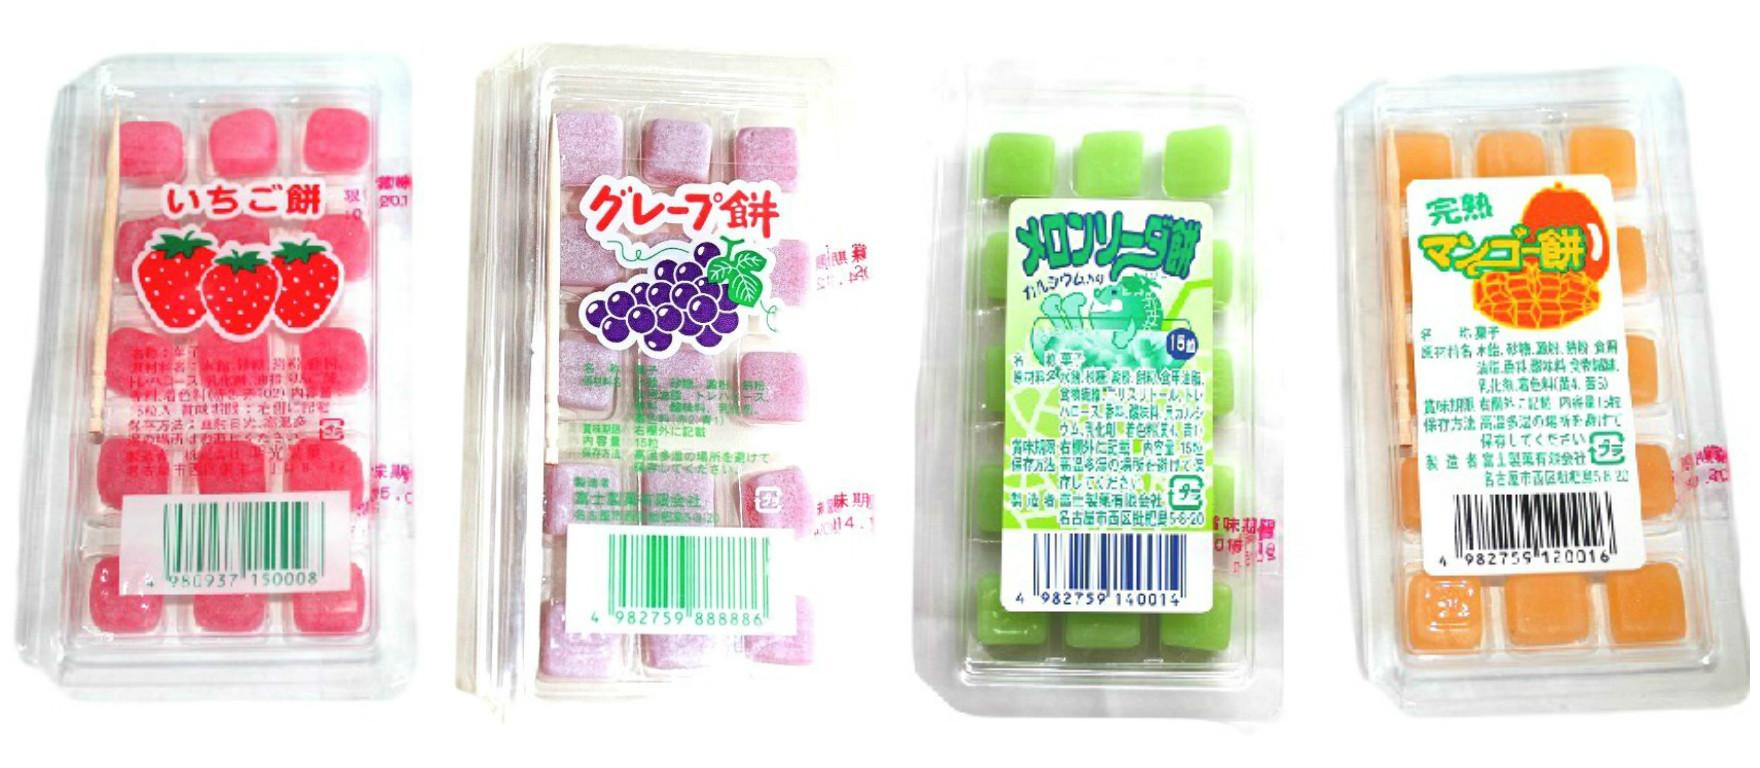 Strawberry Mango Melon Soda Grape Flavor Mochi Candy